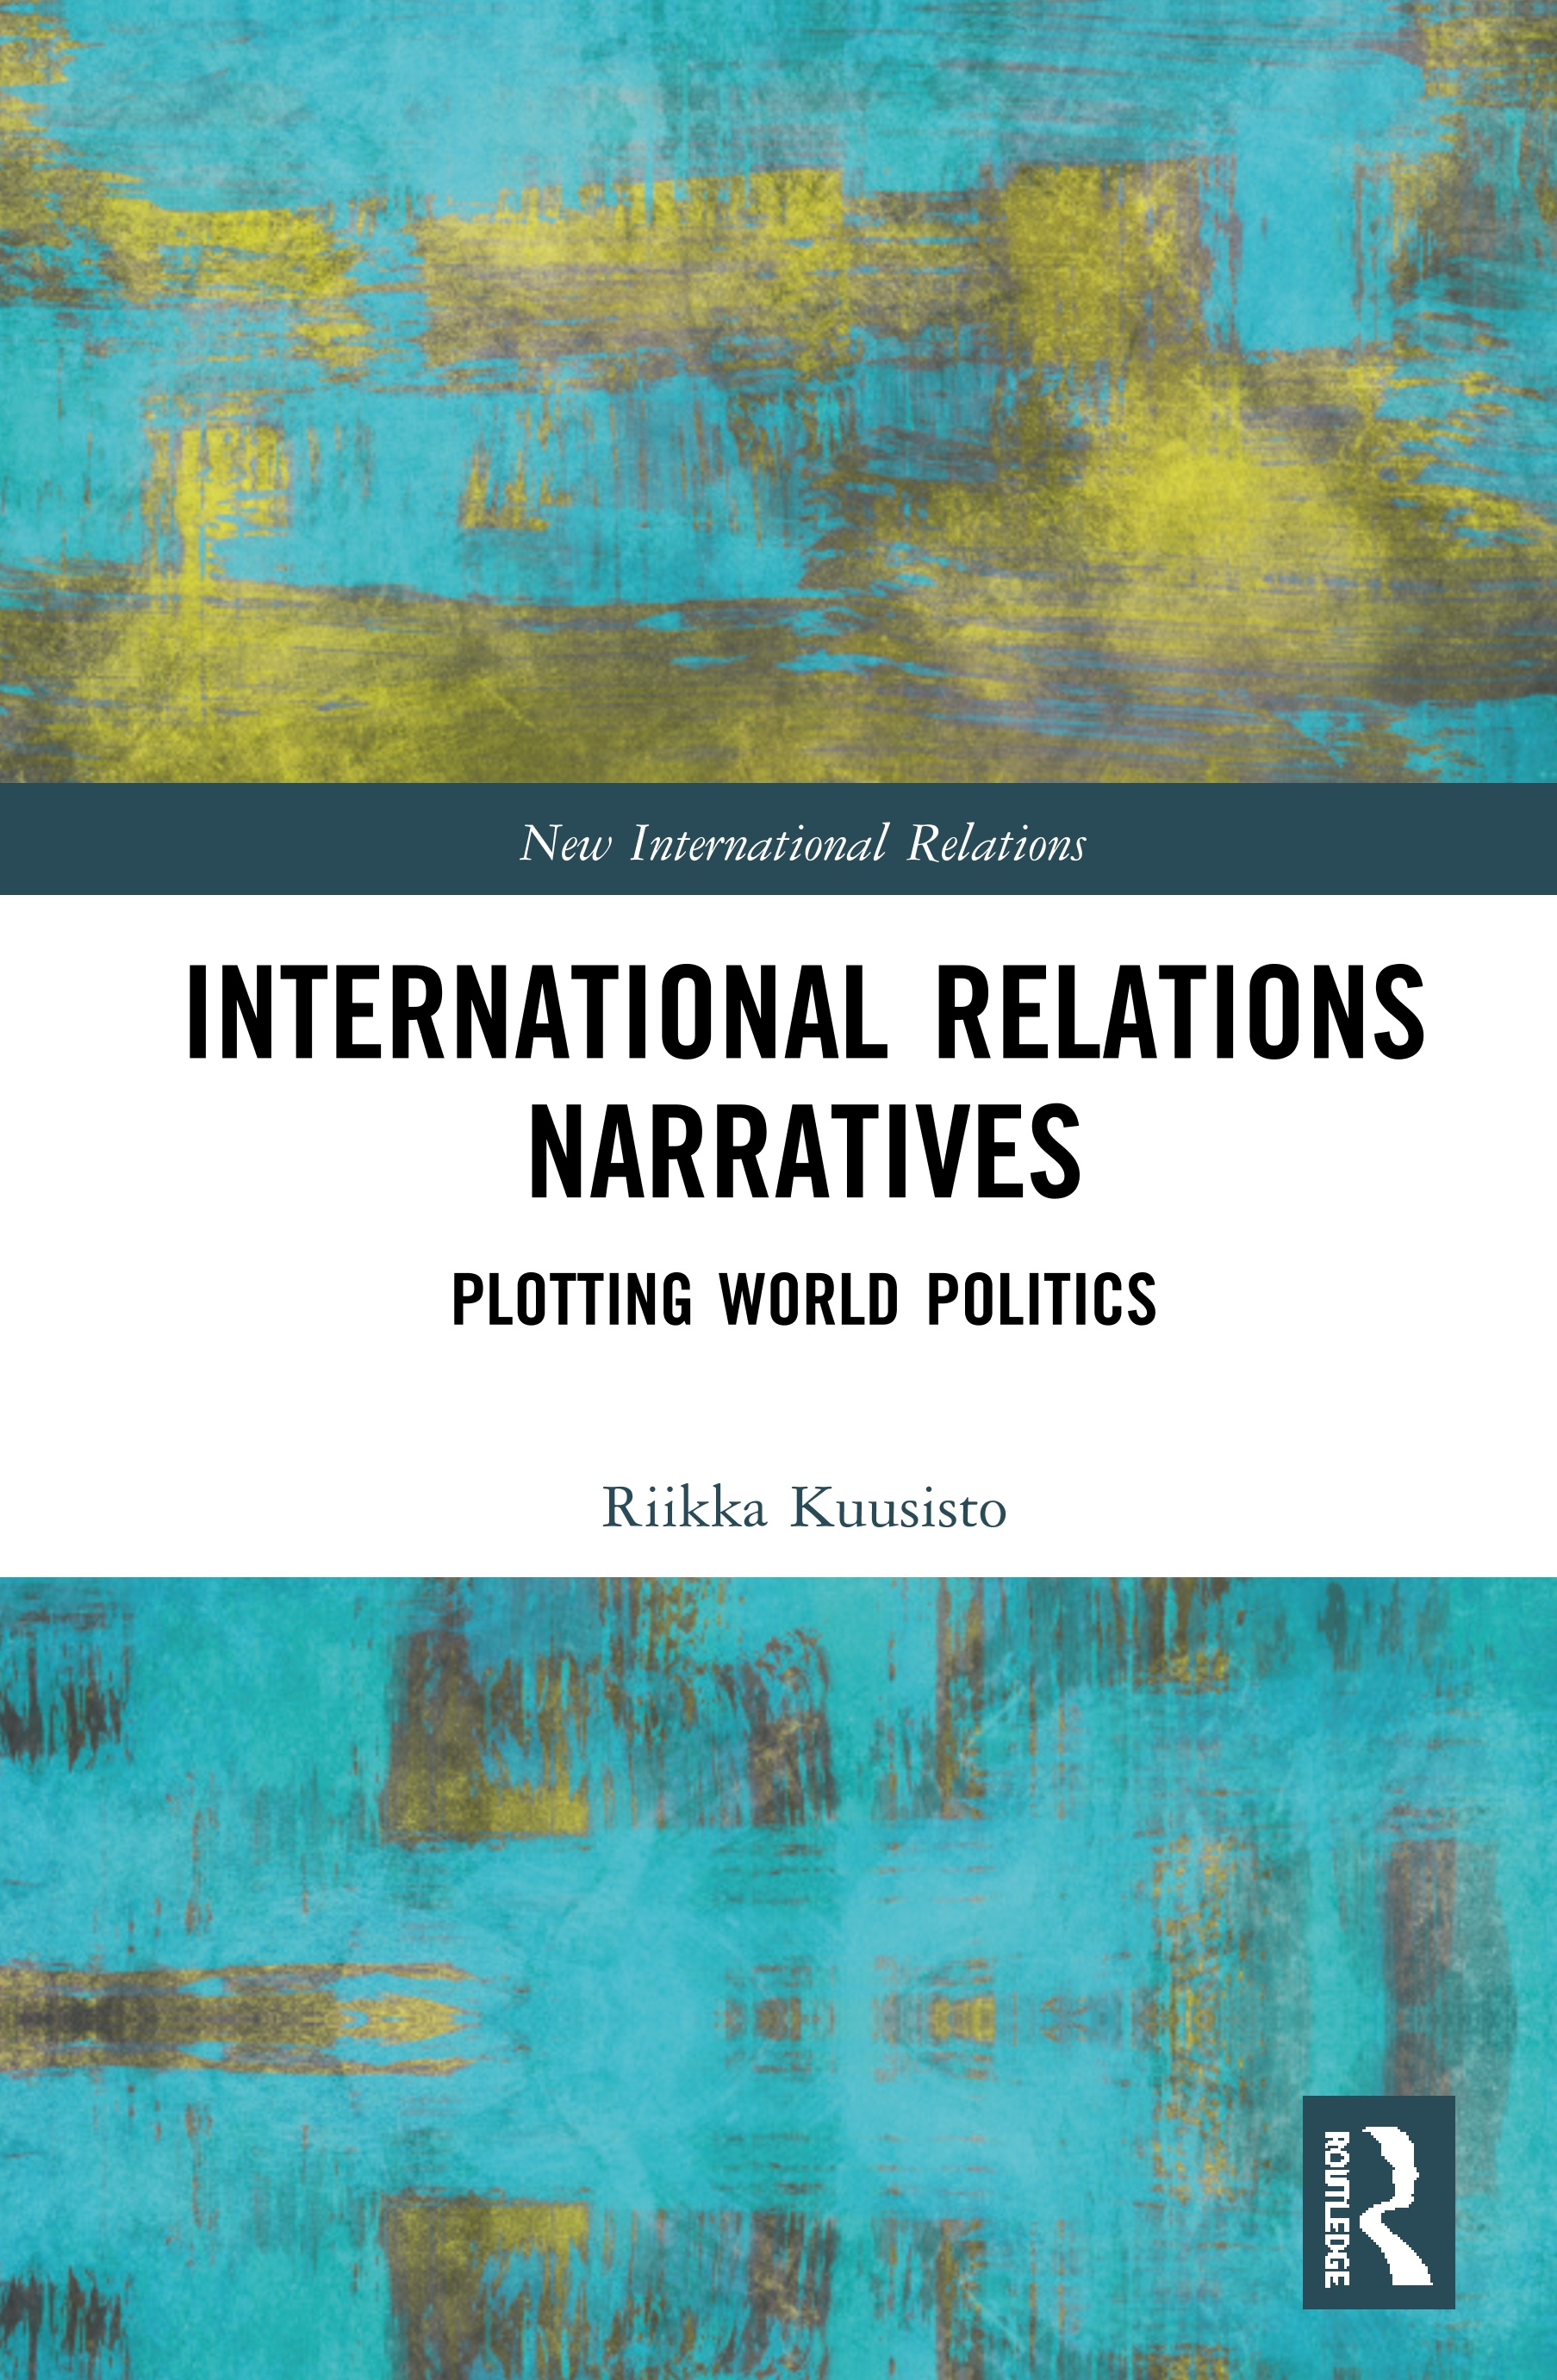 International Relations Narratives: Plotting World Politics book cover